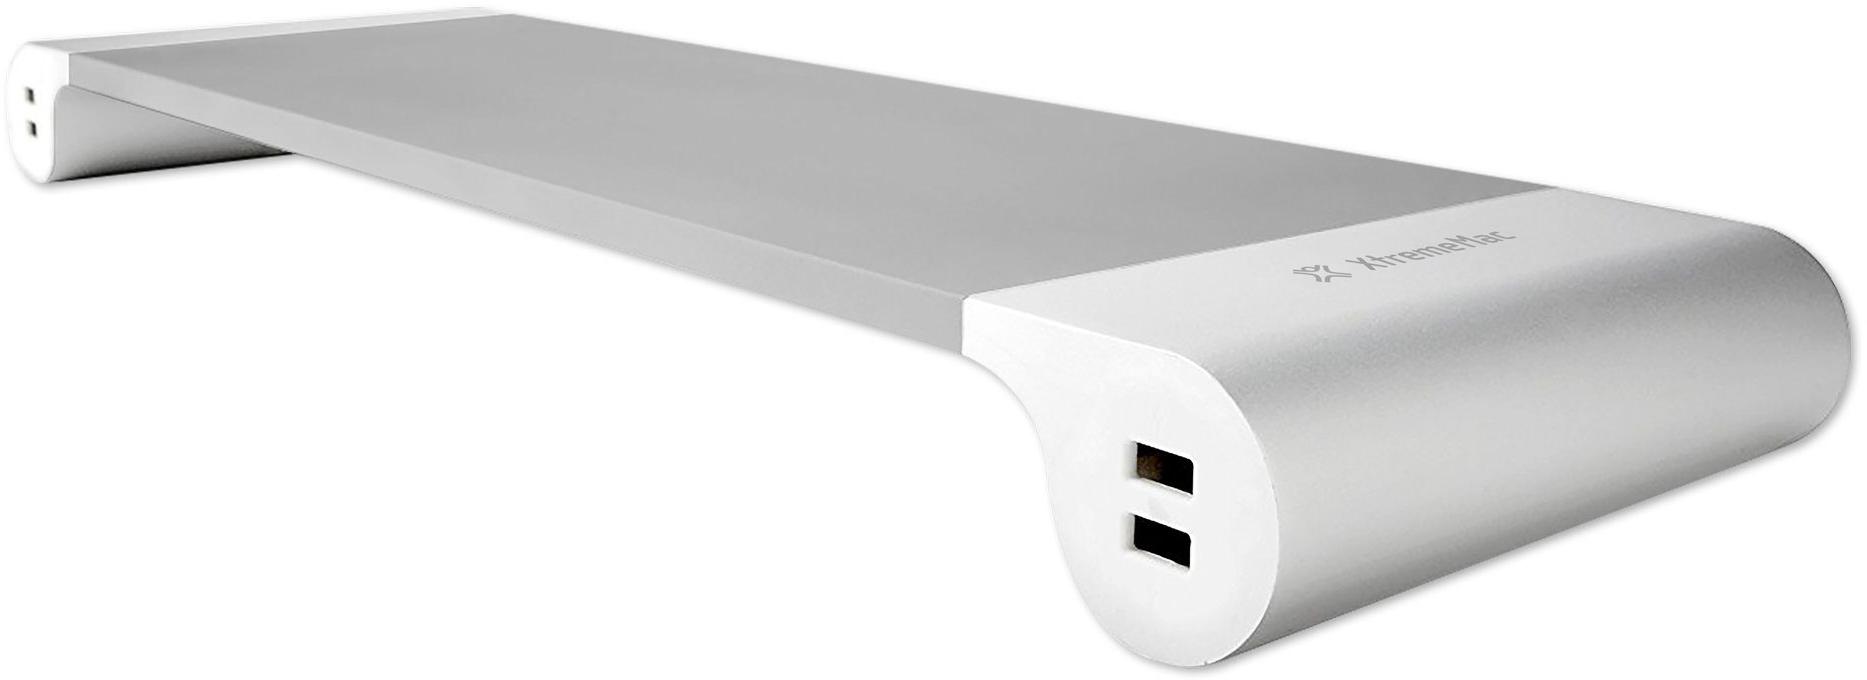 Подставка XtremeMac Computer Stand 4xUSB XM-STAND1-SLV (Silver)